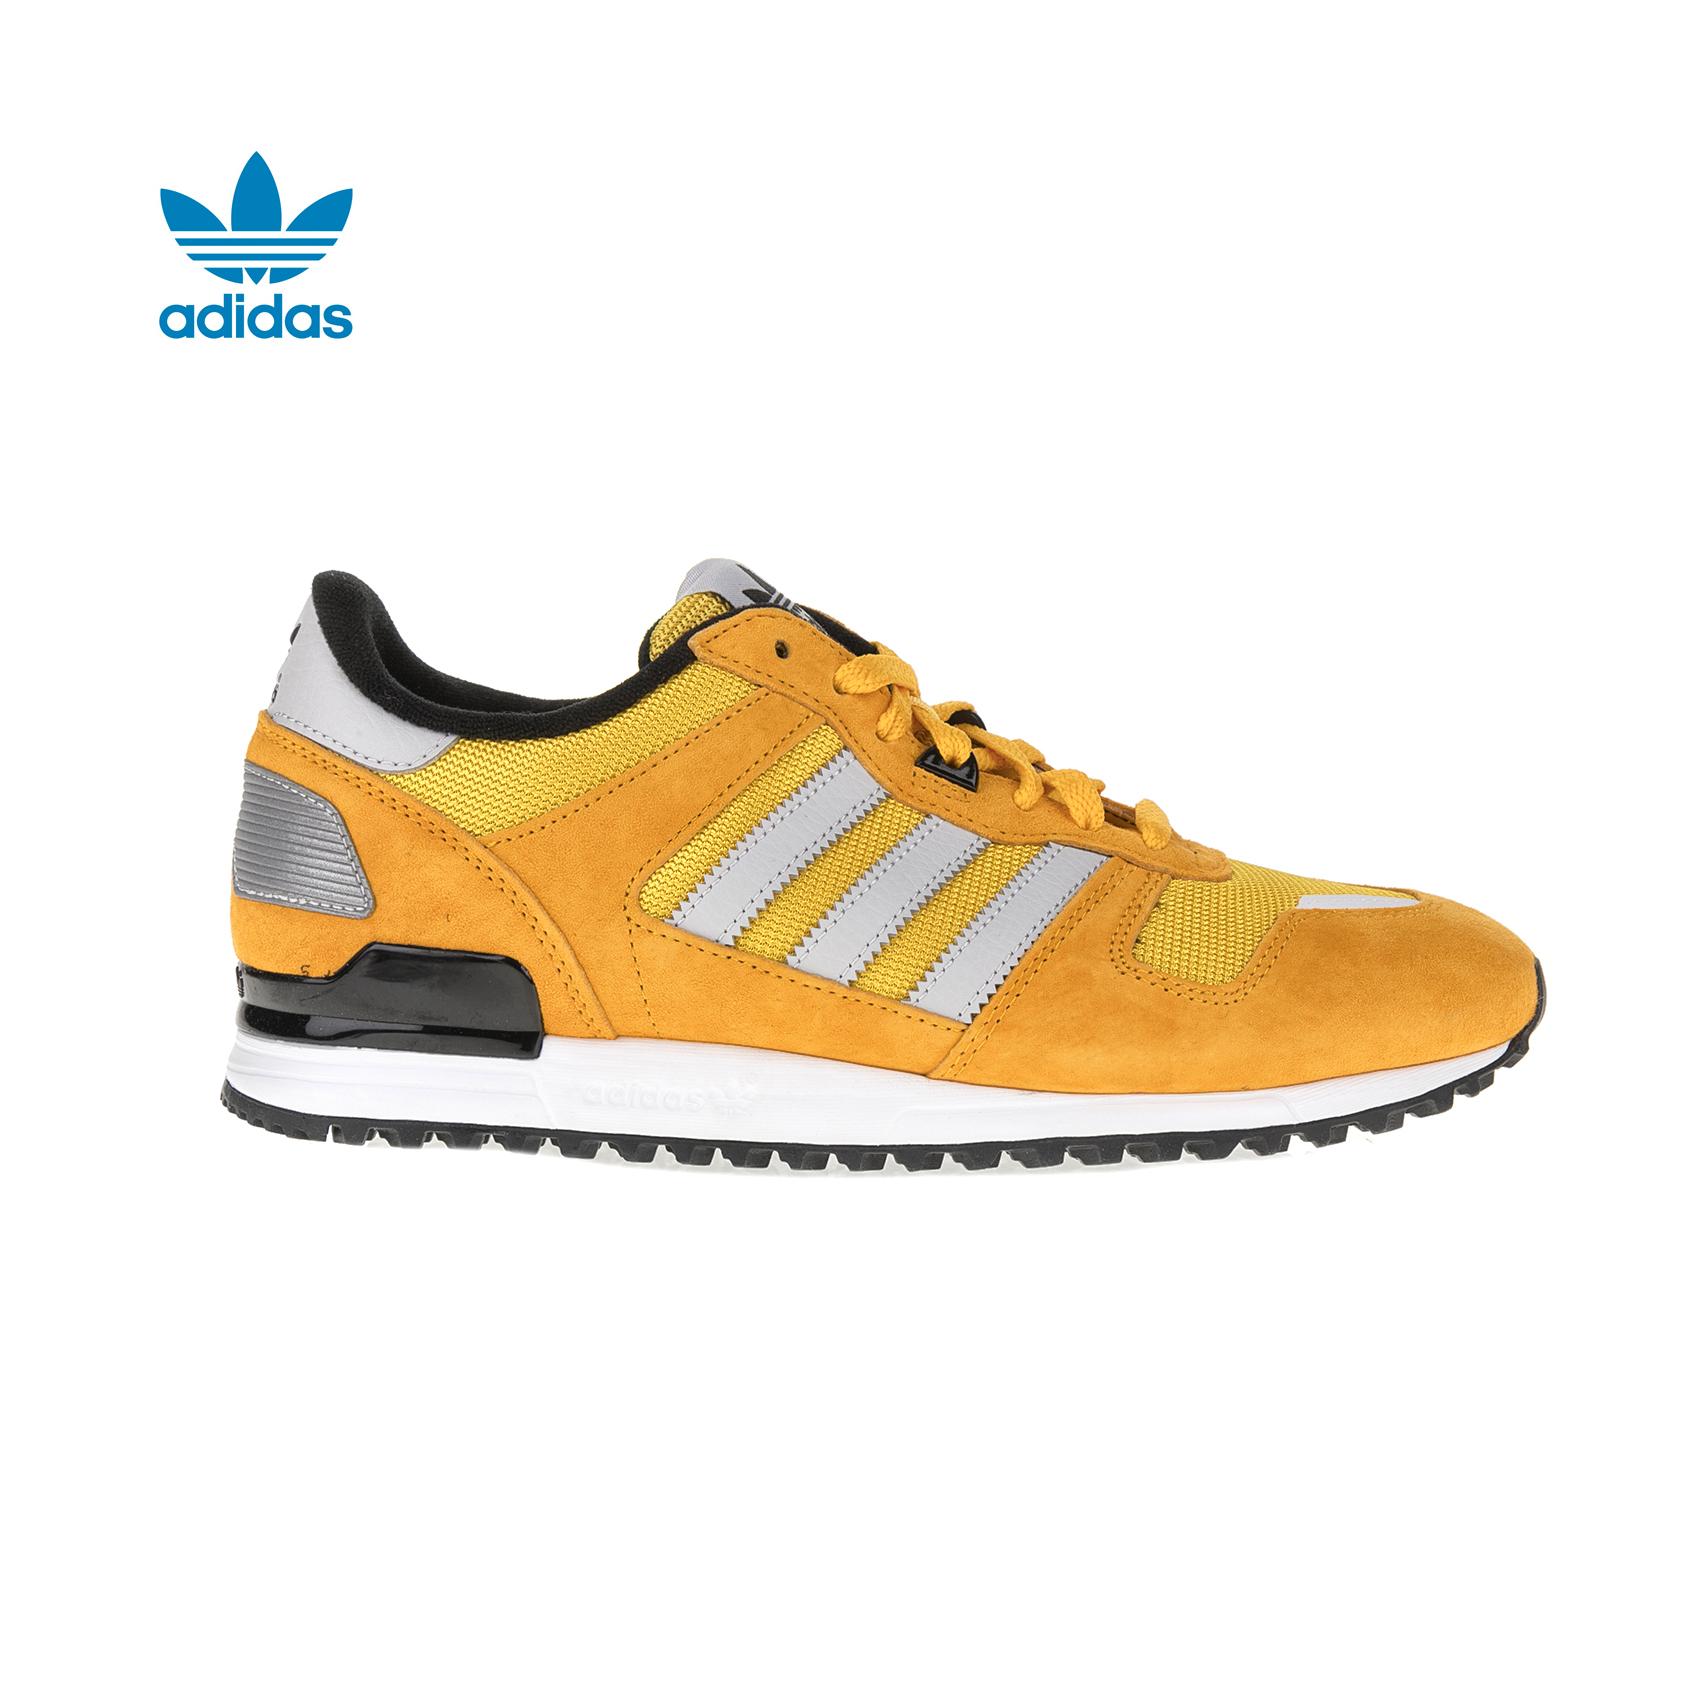 358073c5f64 adidas Originals - Ανδρικά sneakers adidas ZX 700 κίτρινα